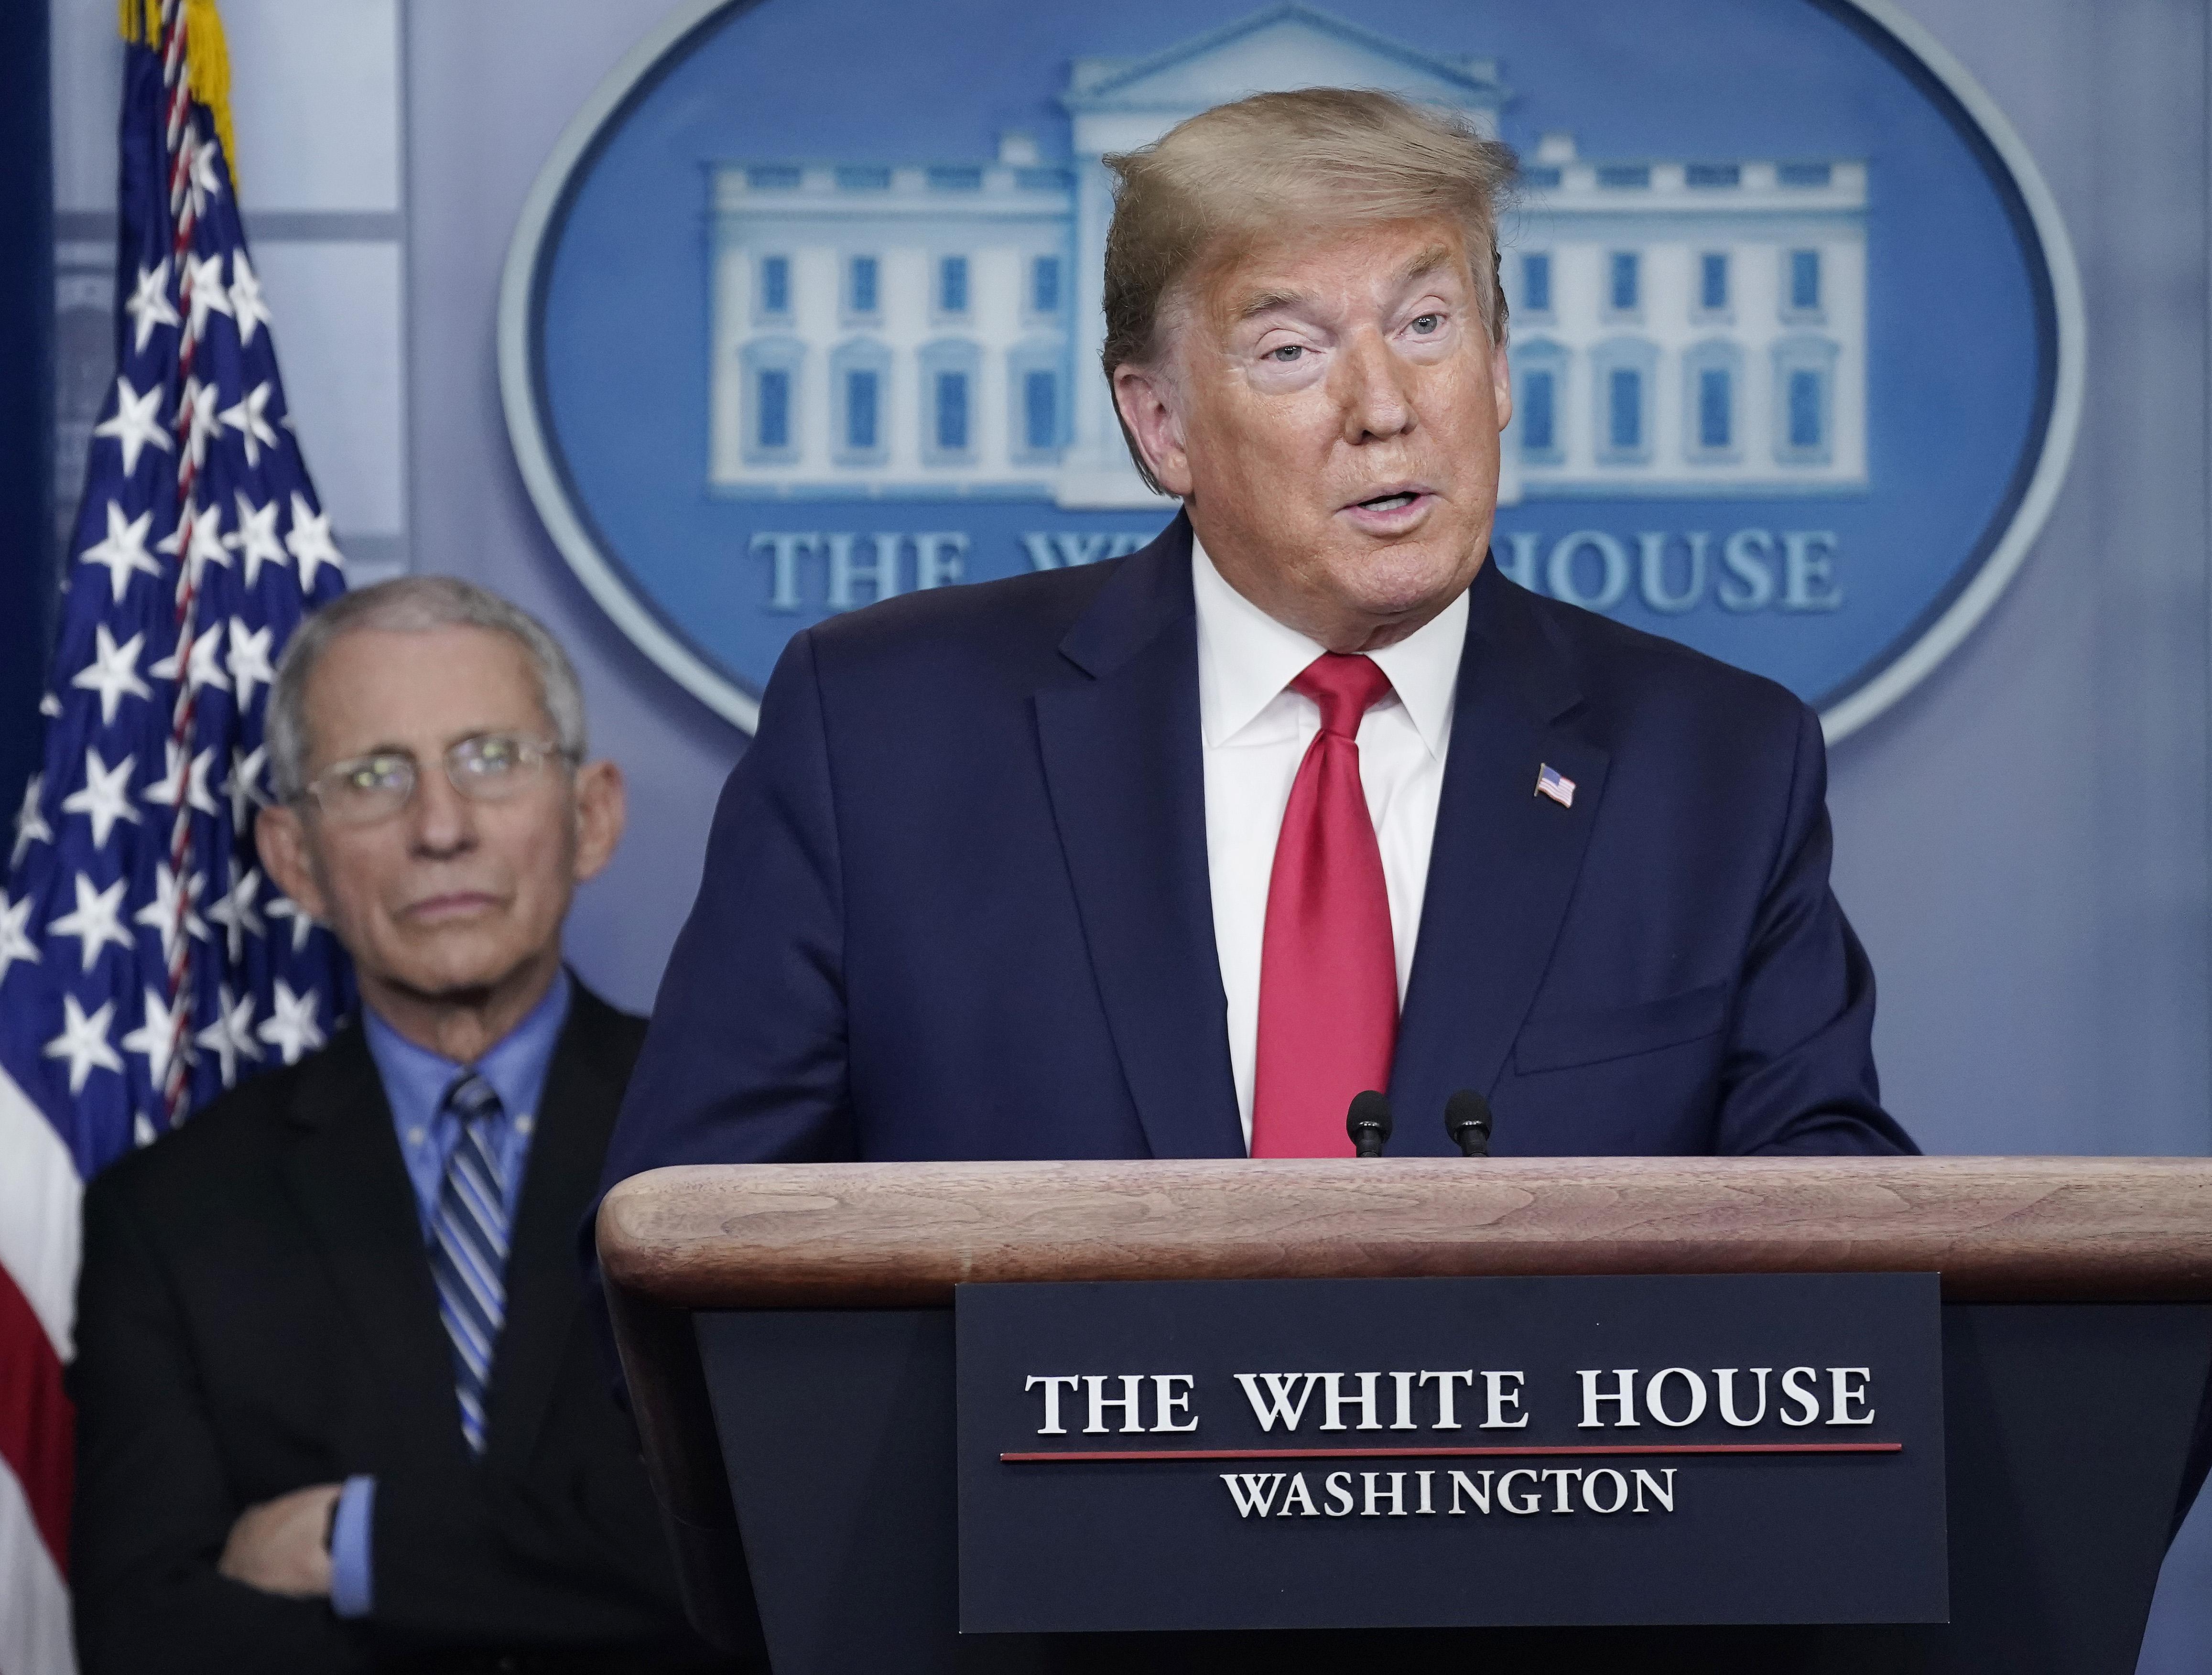 Fact Check: Trump's Misfires on Coronavirus Death Rates, Tests